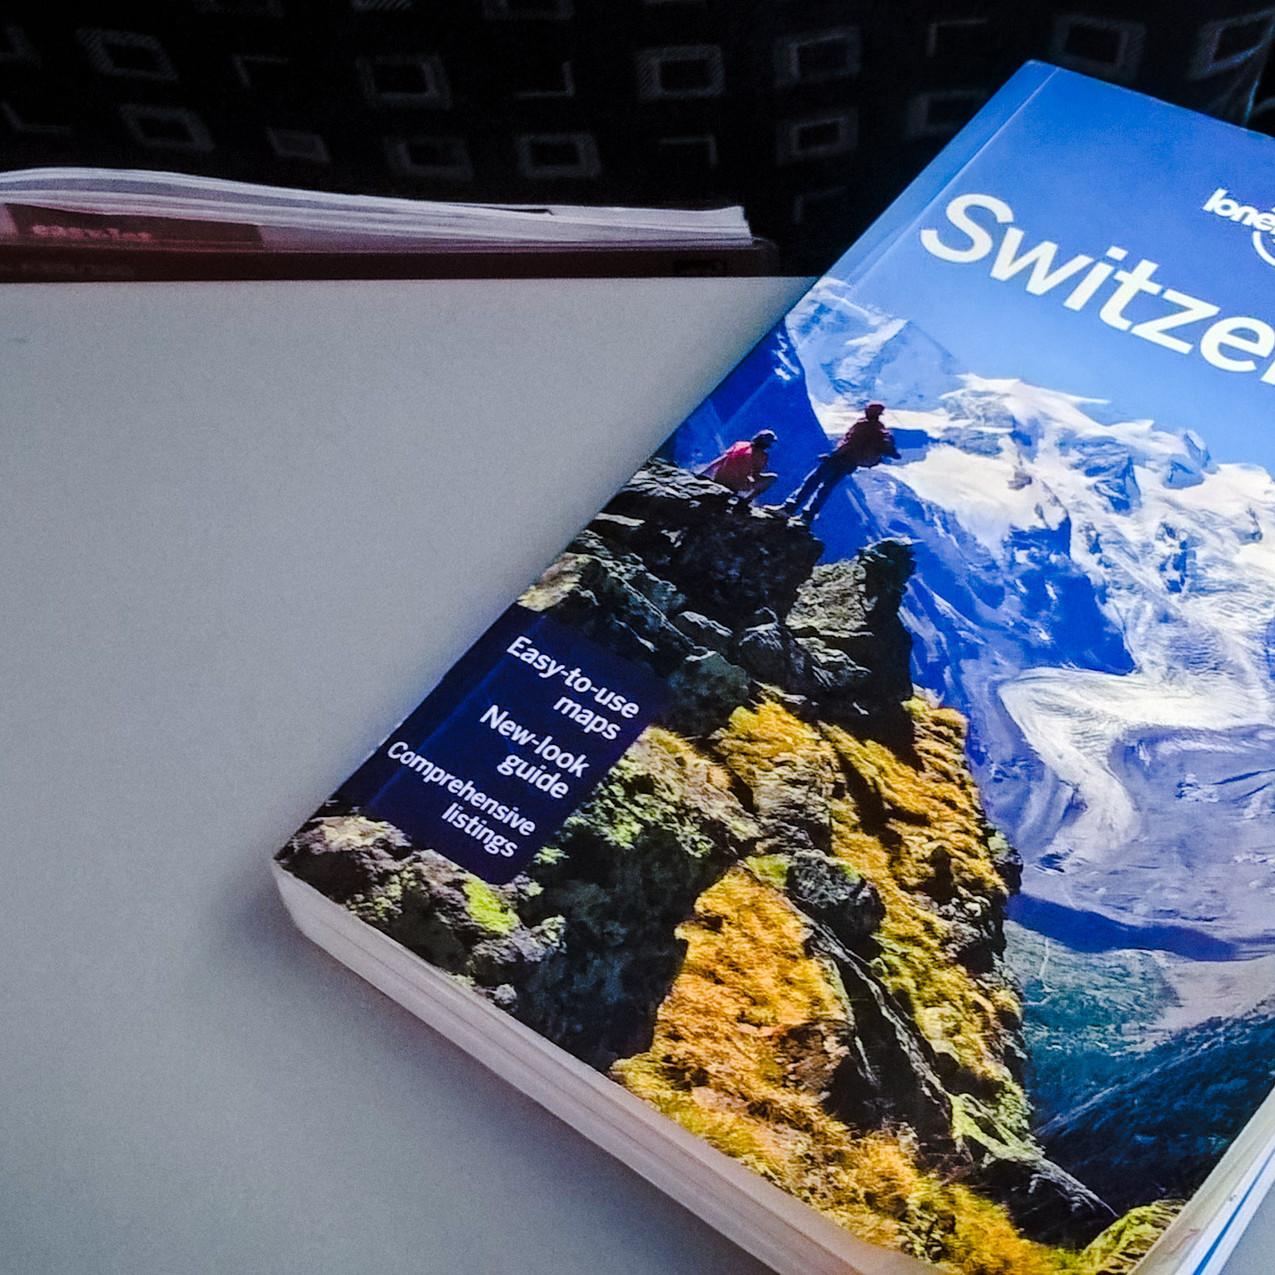 Day trip to Switzerland